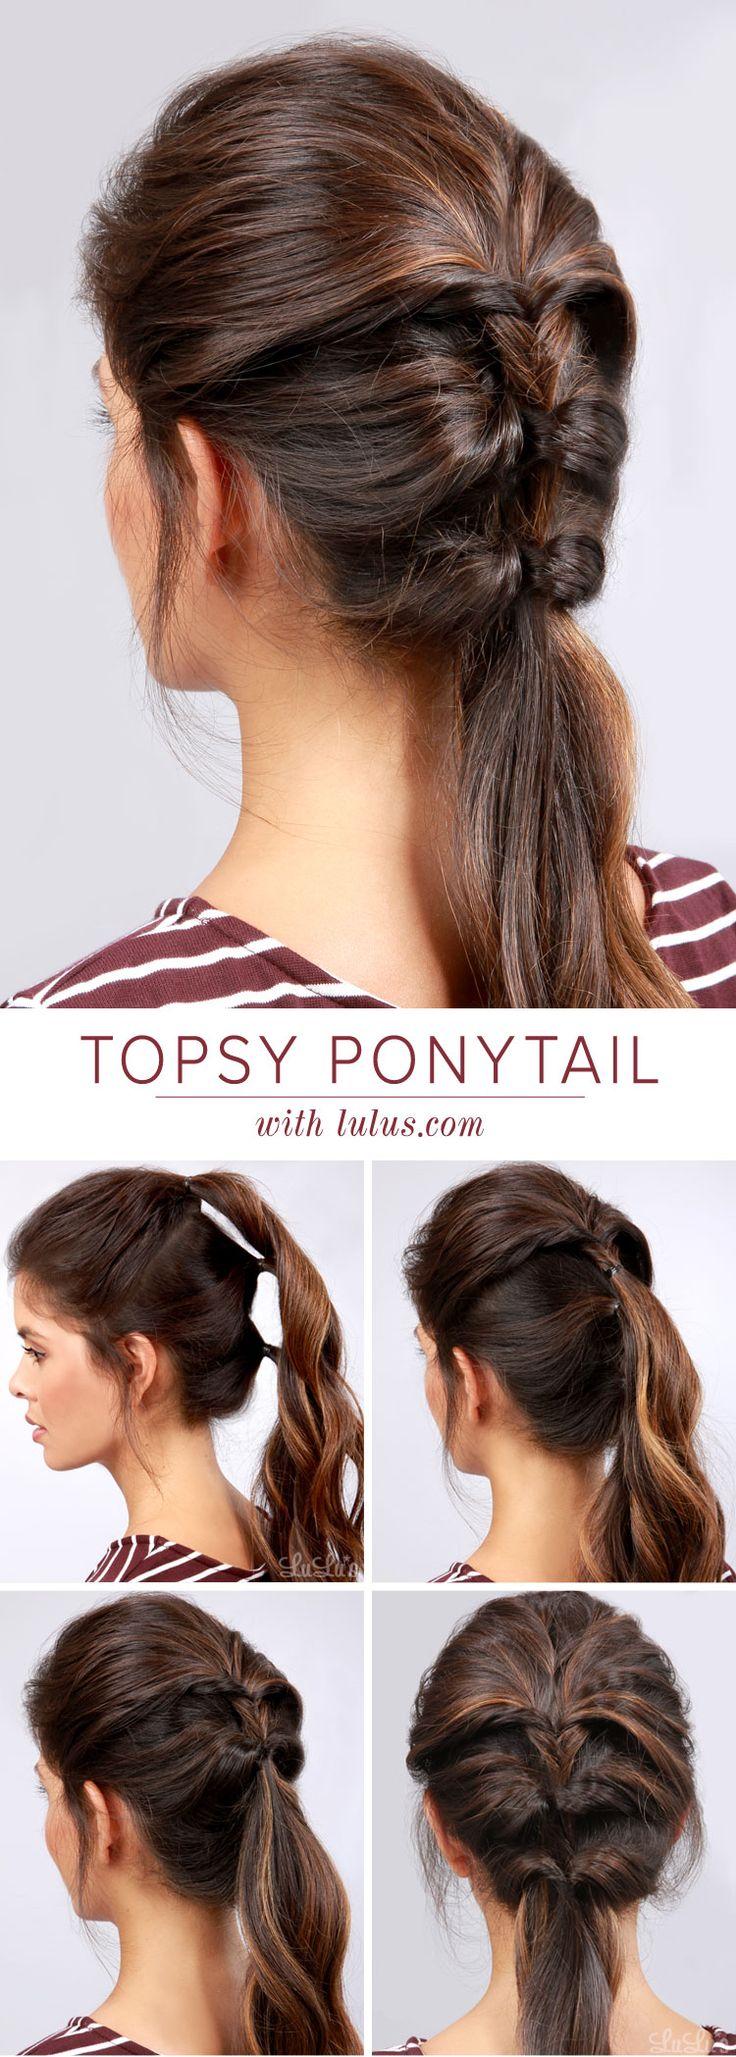 Awe Inspiring 1000 Ideas About Stylish Ponytail On Pinterest Retro Ponytail Short Hairstyles For Black Women Fulllsitofus